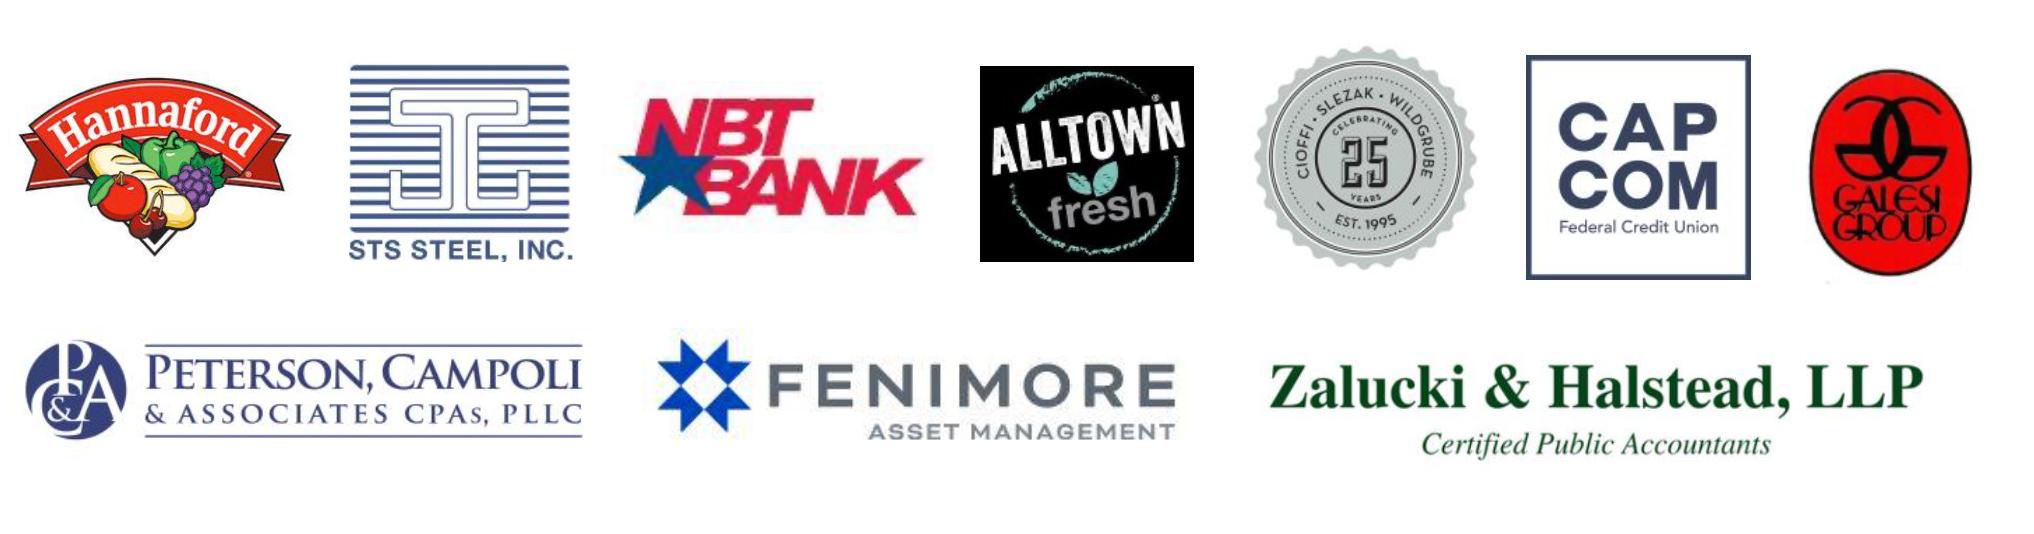 sponsor logos three